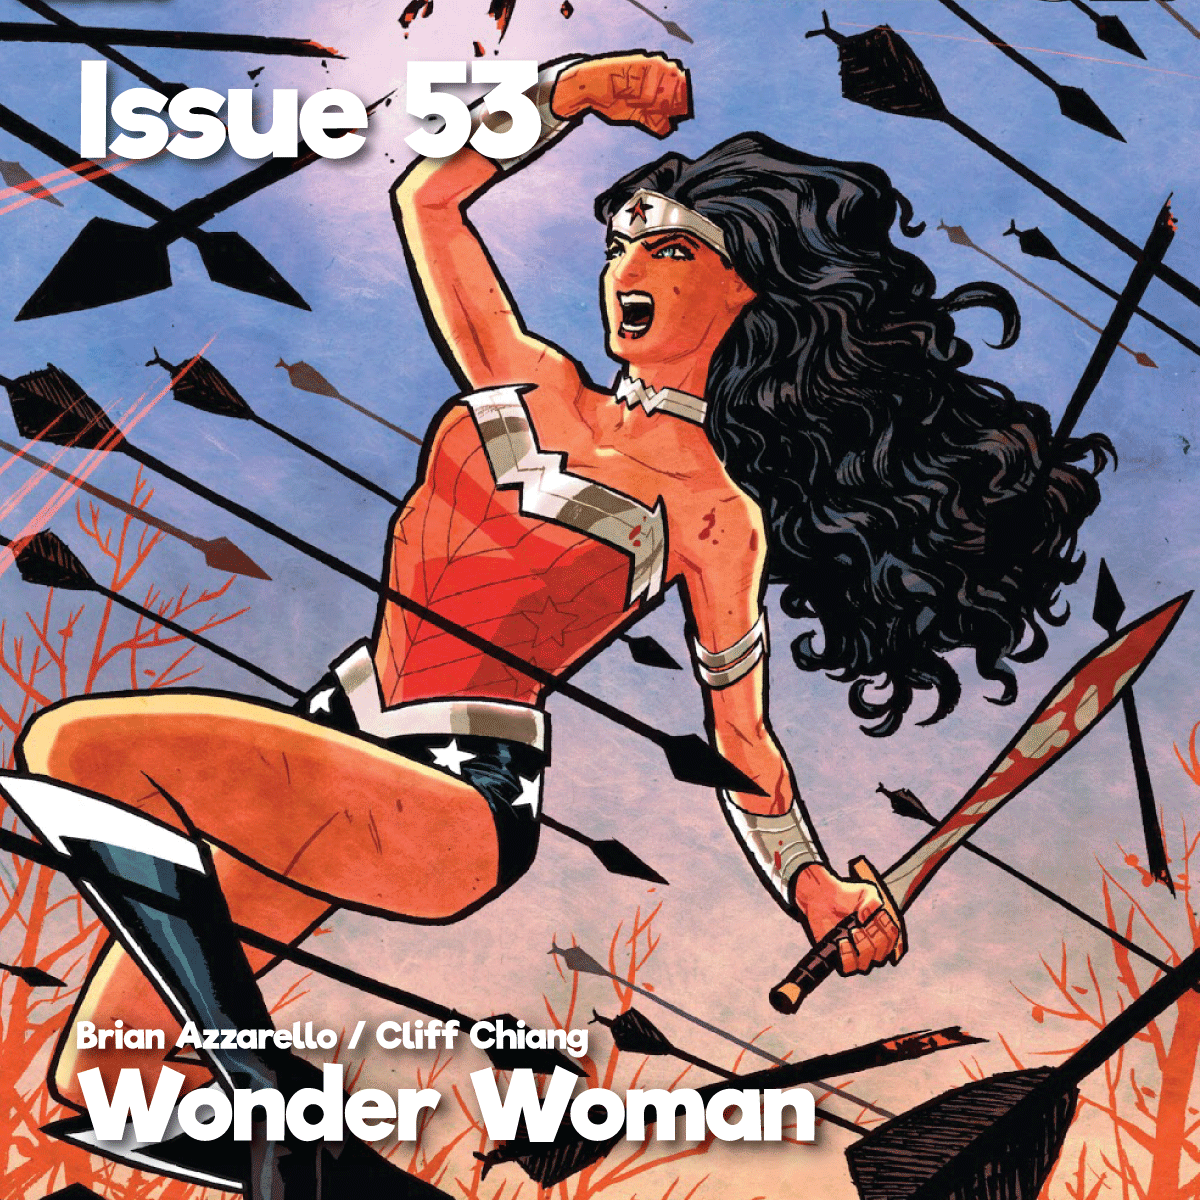 Issue53_WonderWoman_1200x1200.png